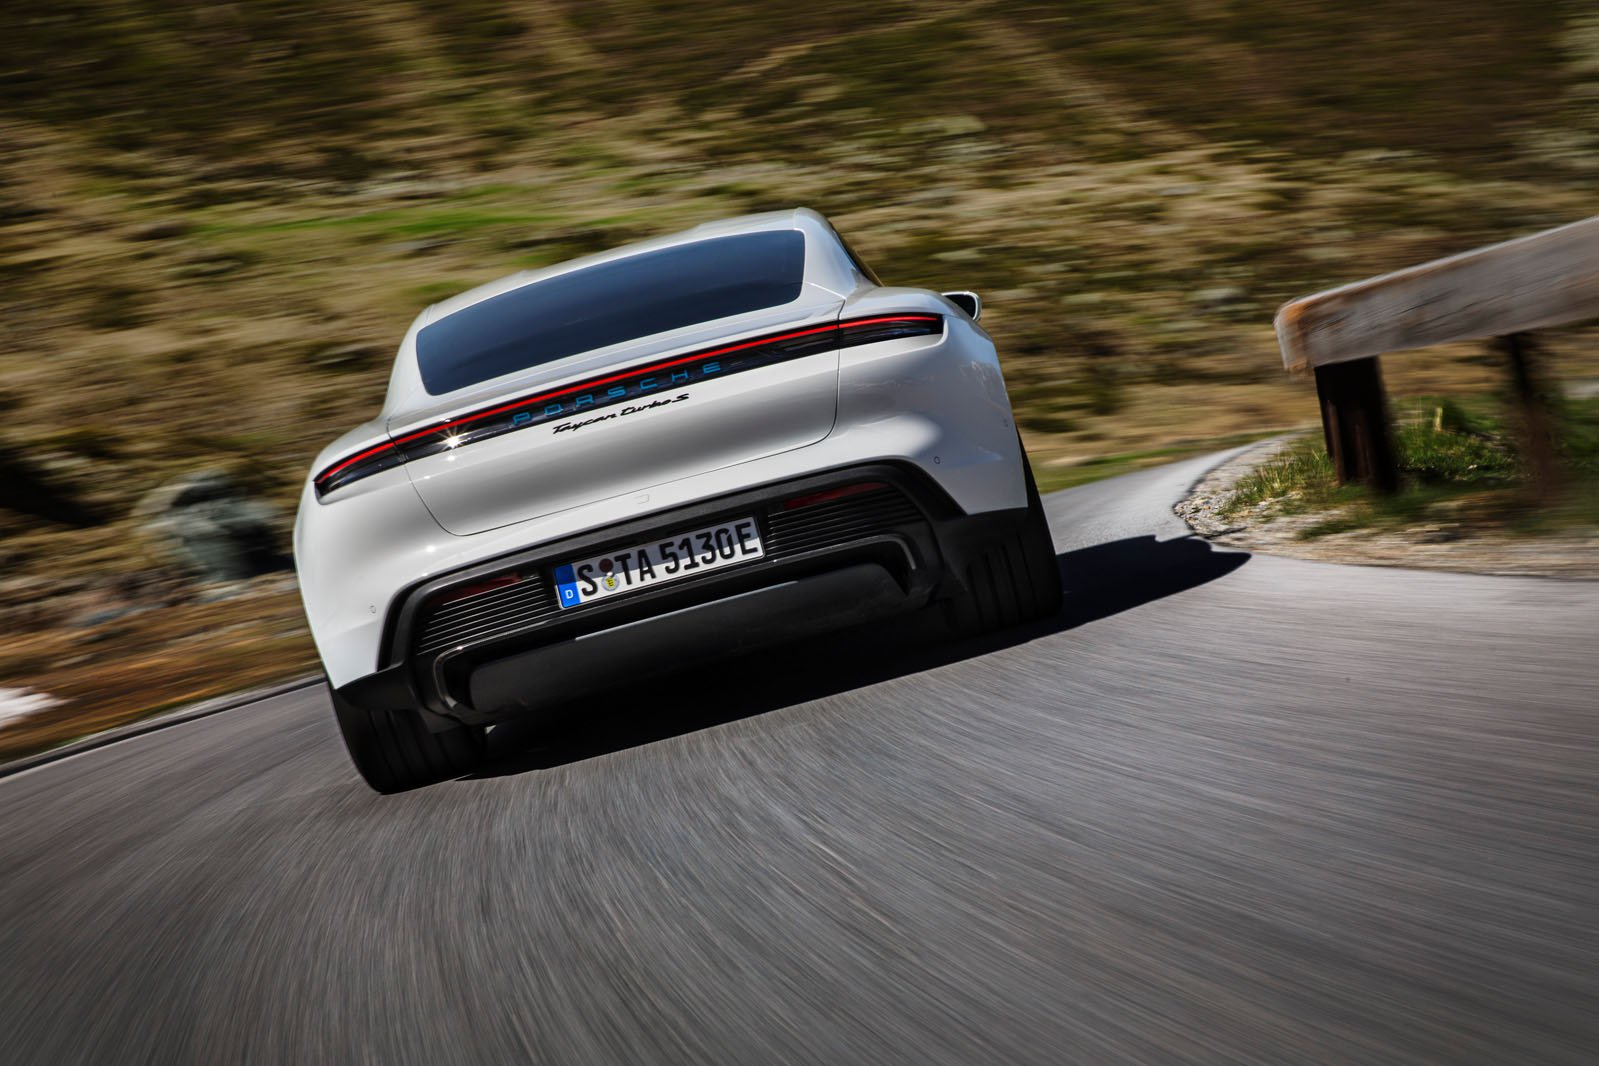 2020 Porsche Taycan rear